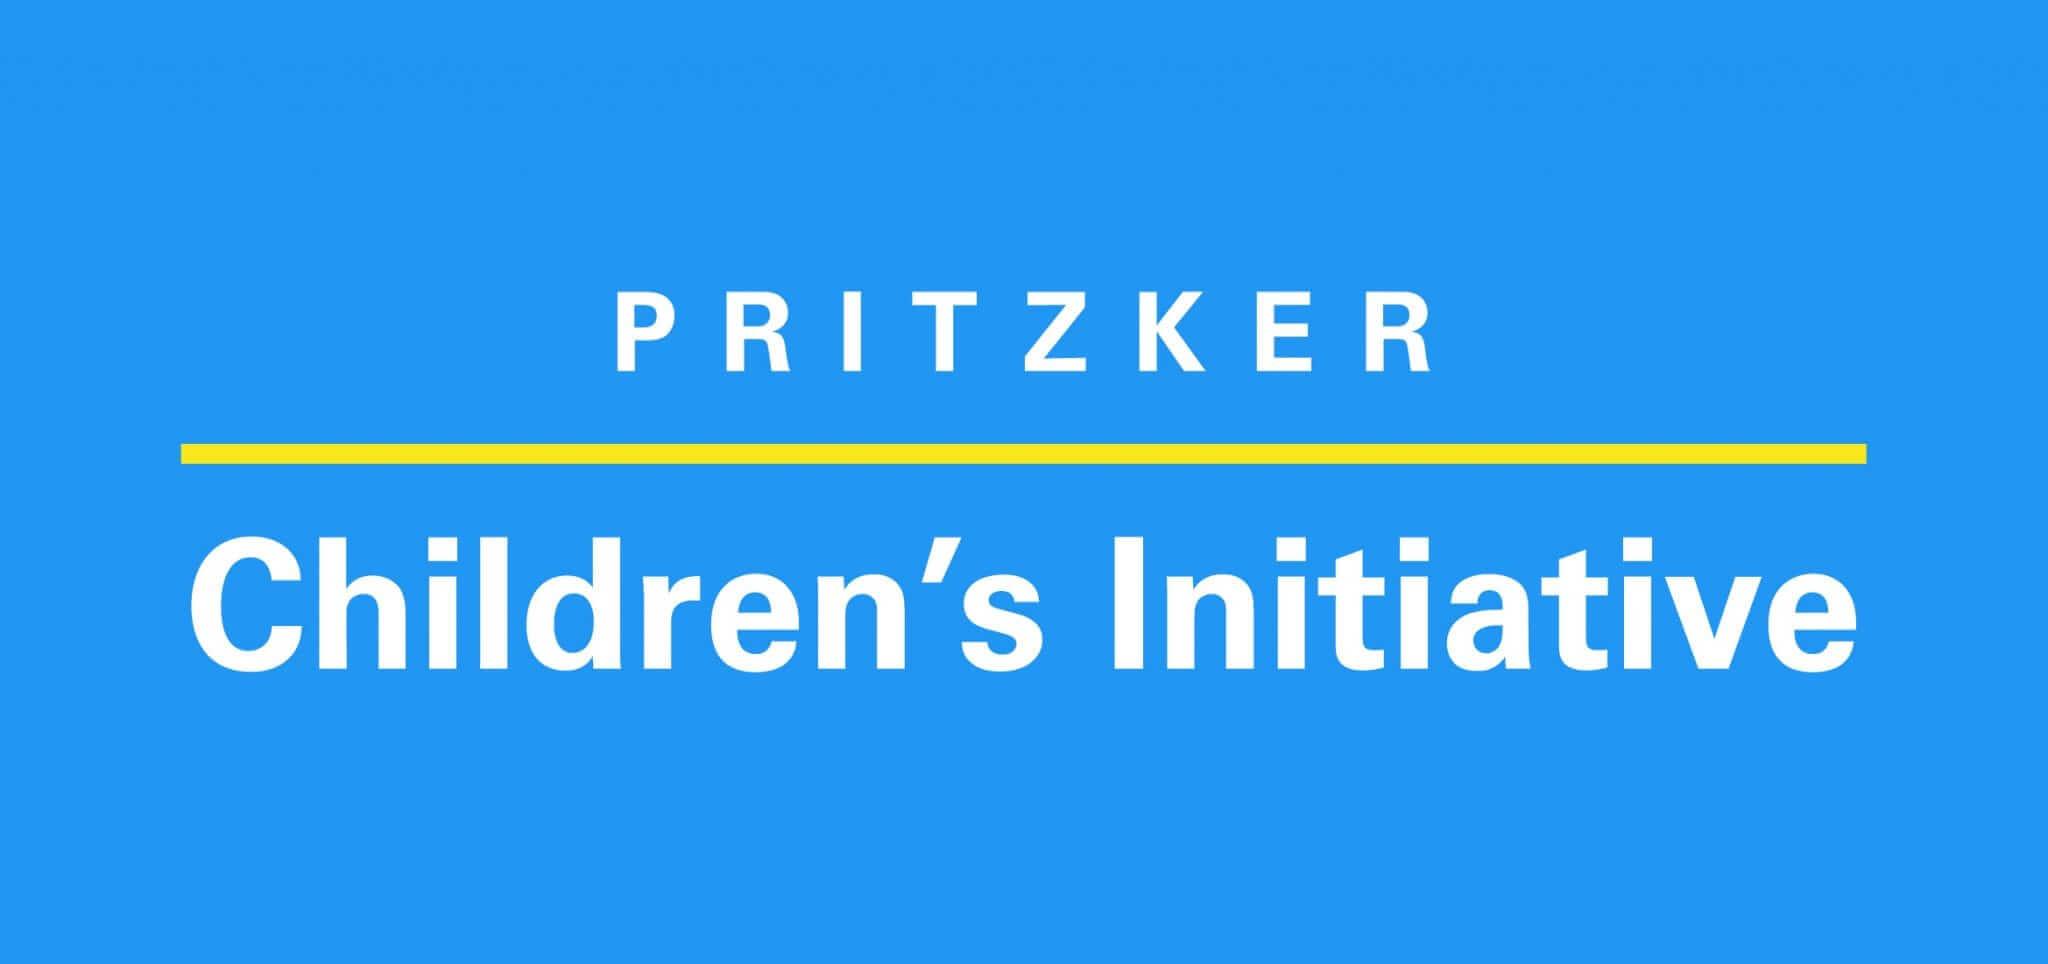 Pritzkerlogofeb2021